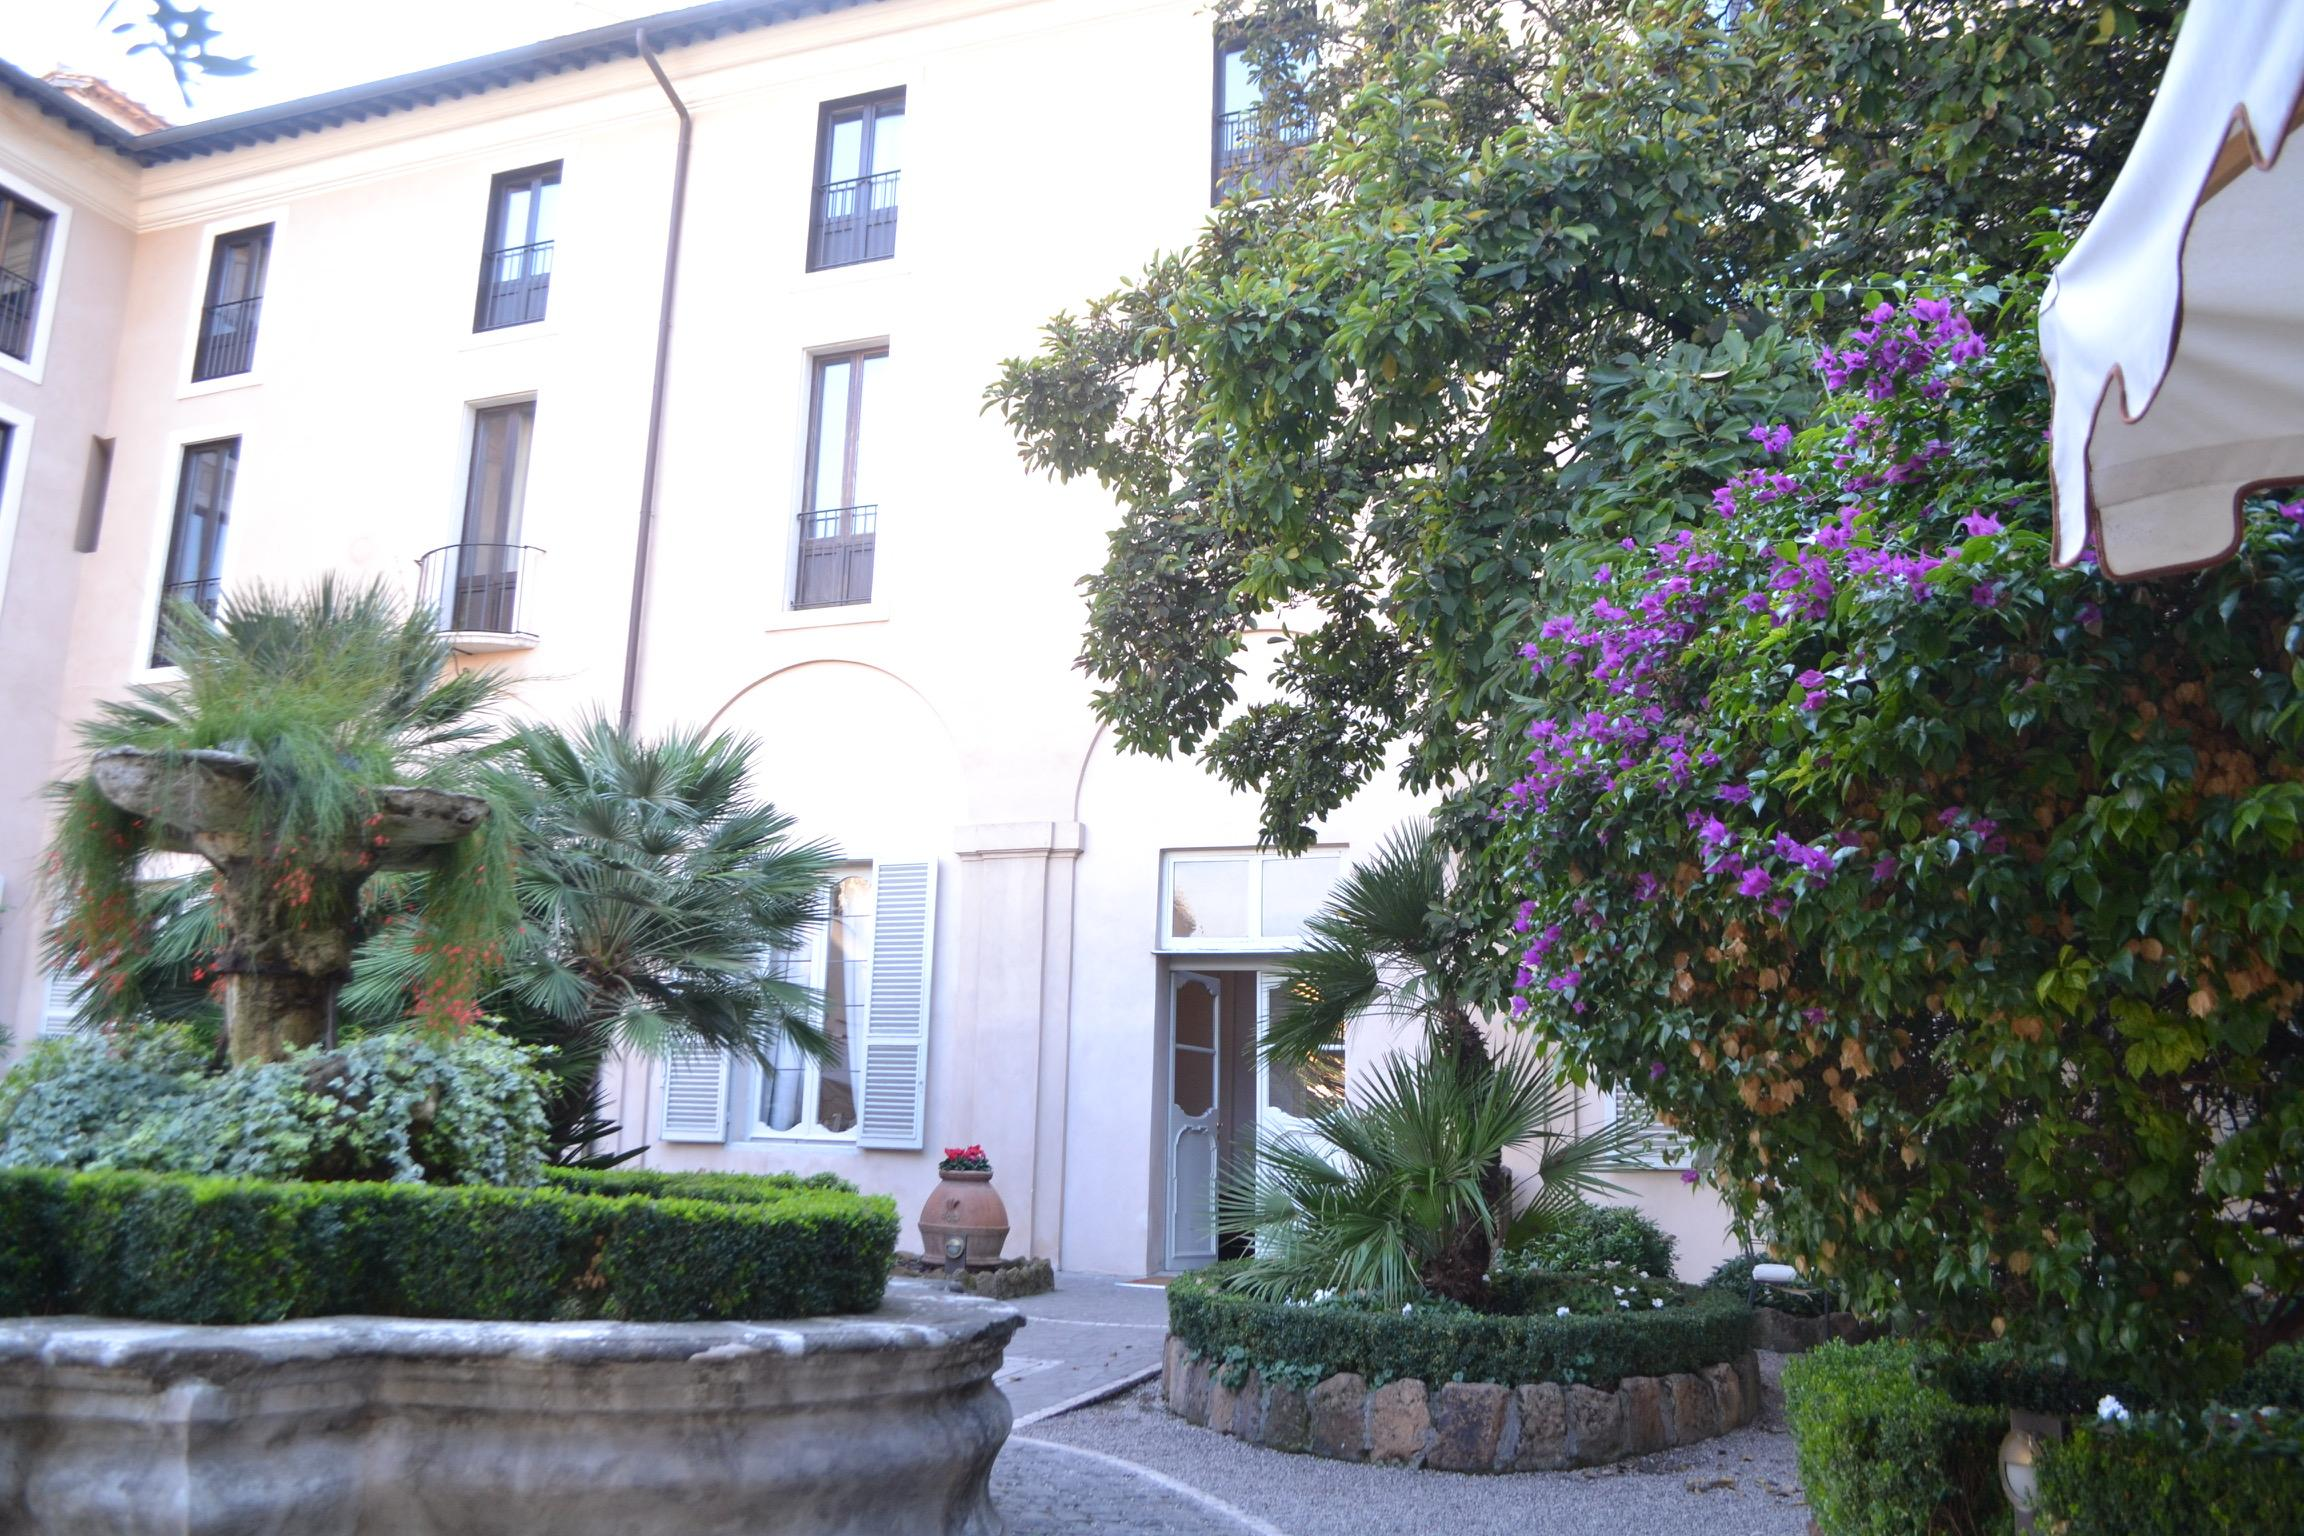 Hotellin puutarha